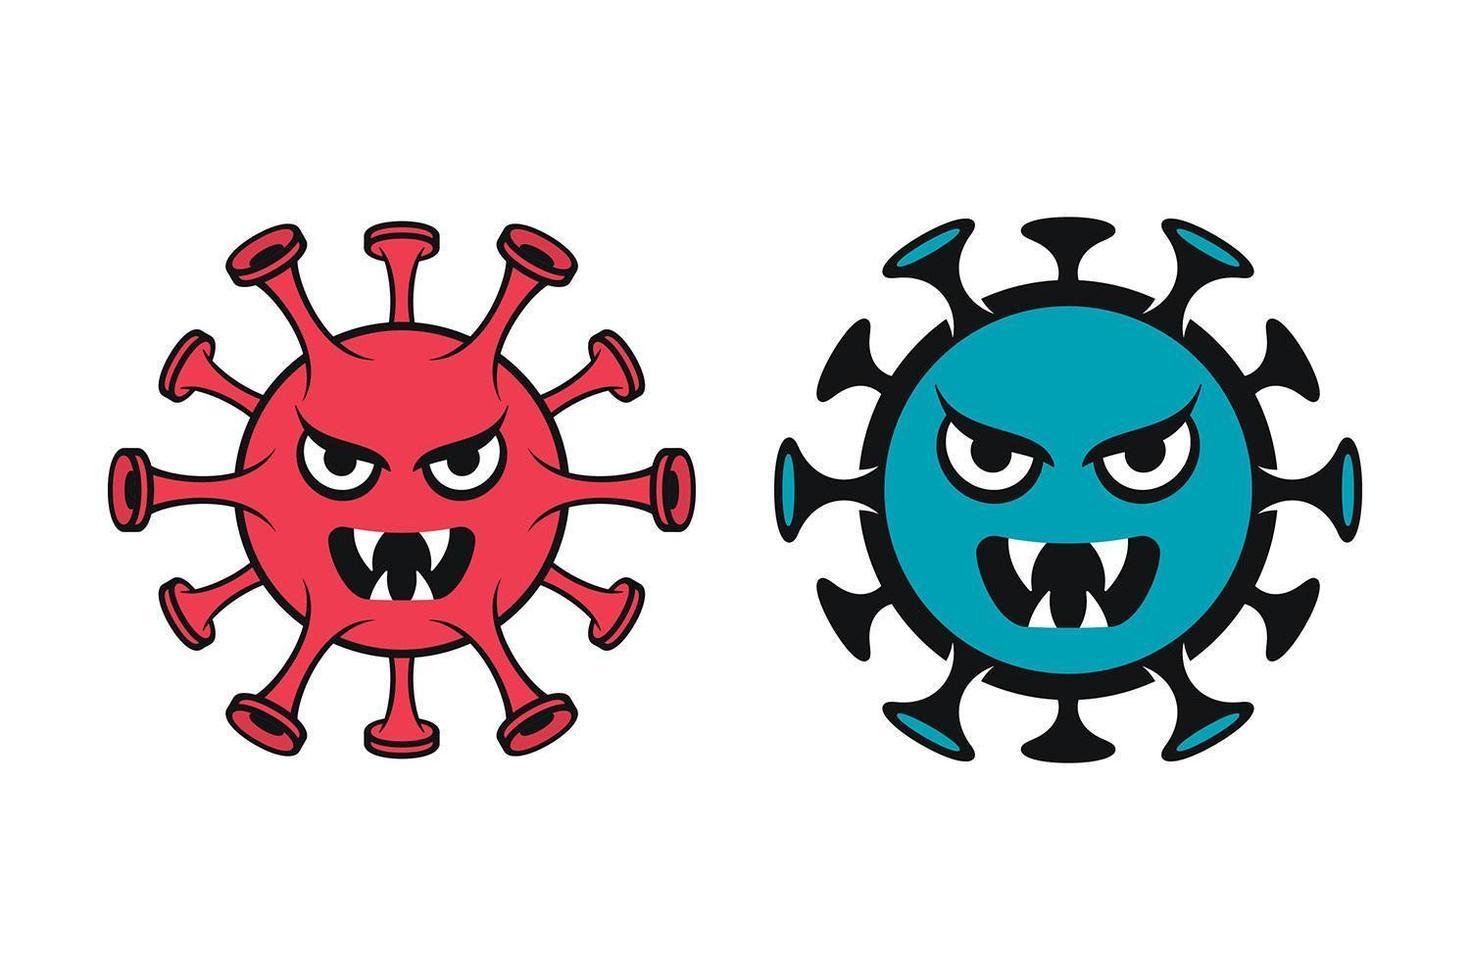 coronavirus covid-19 monsters emoticons vector